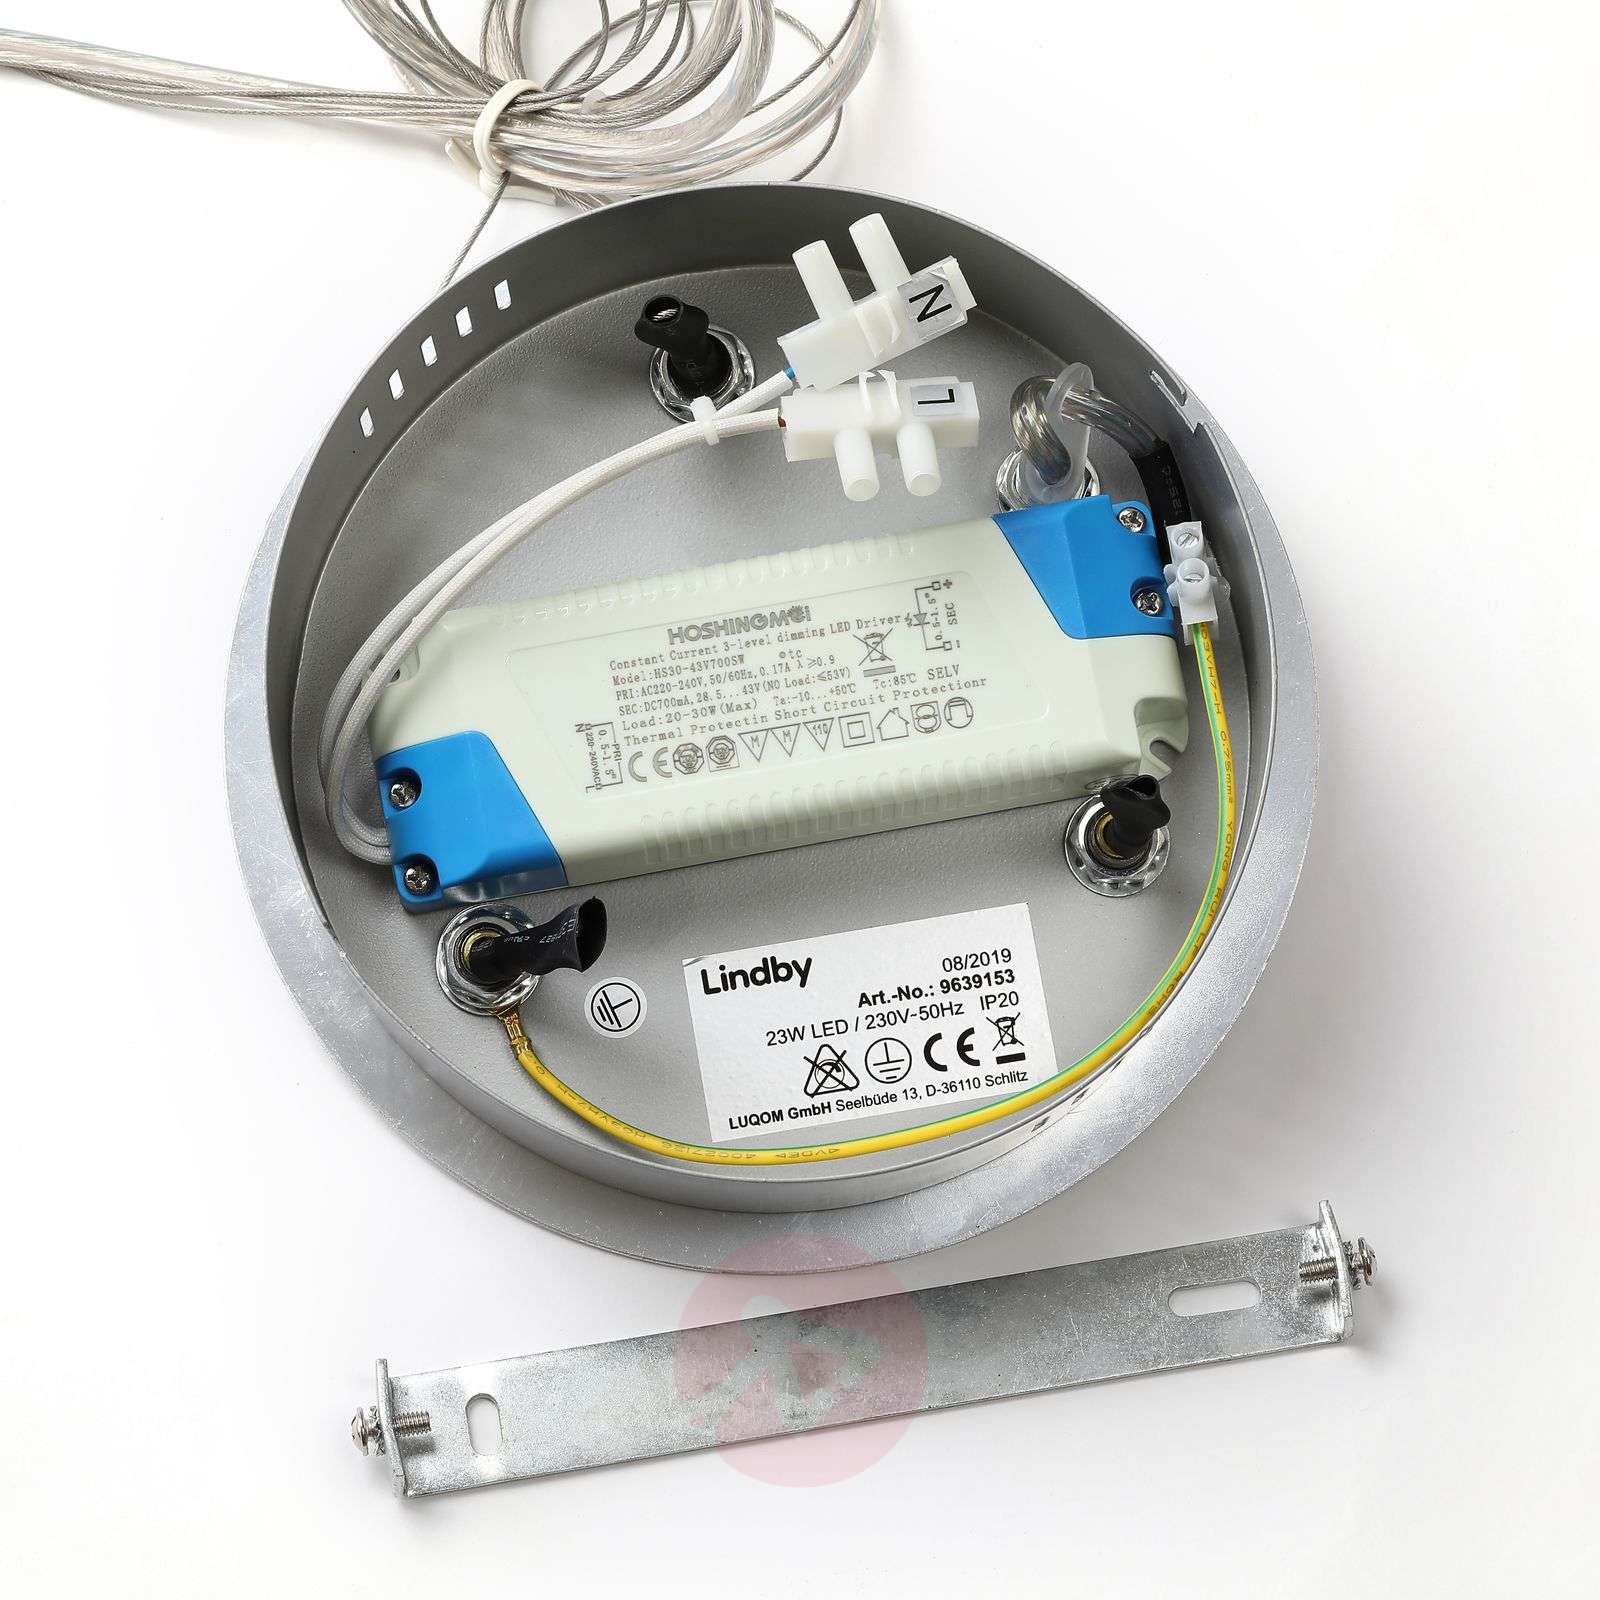 Lindby Katris LED-riippuvalaisin, 73 cm, alumiini-9639153-02